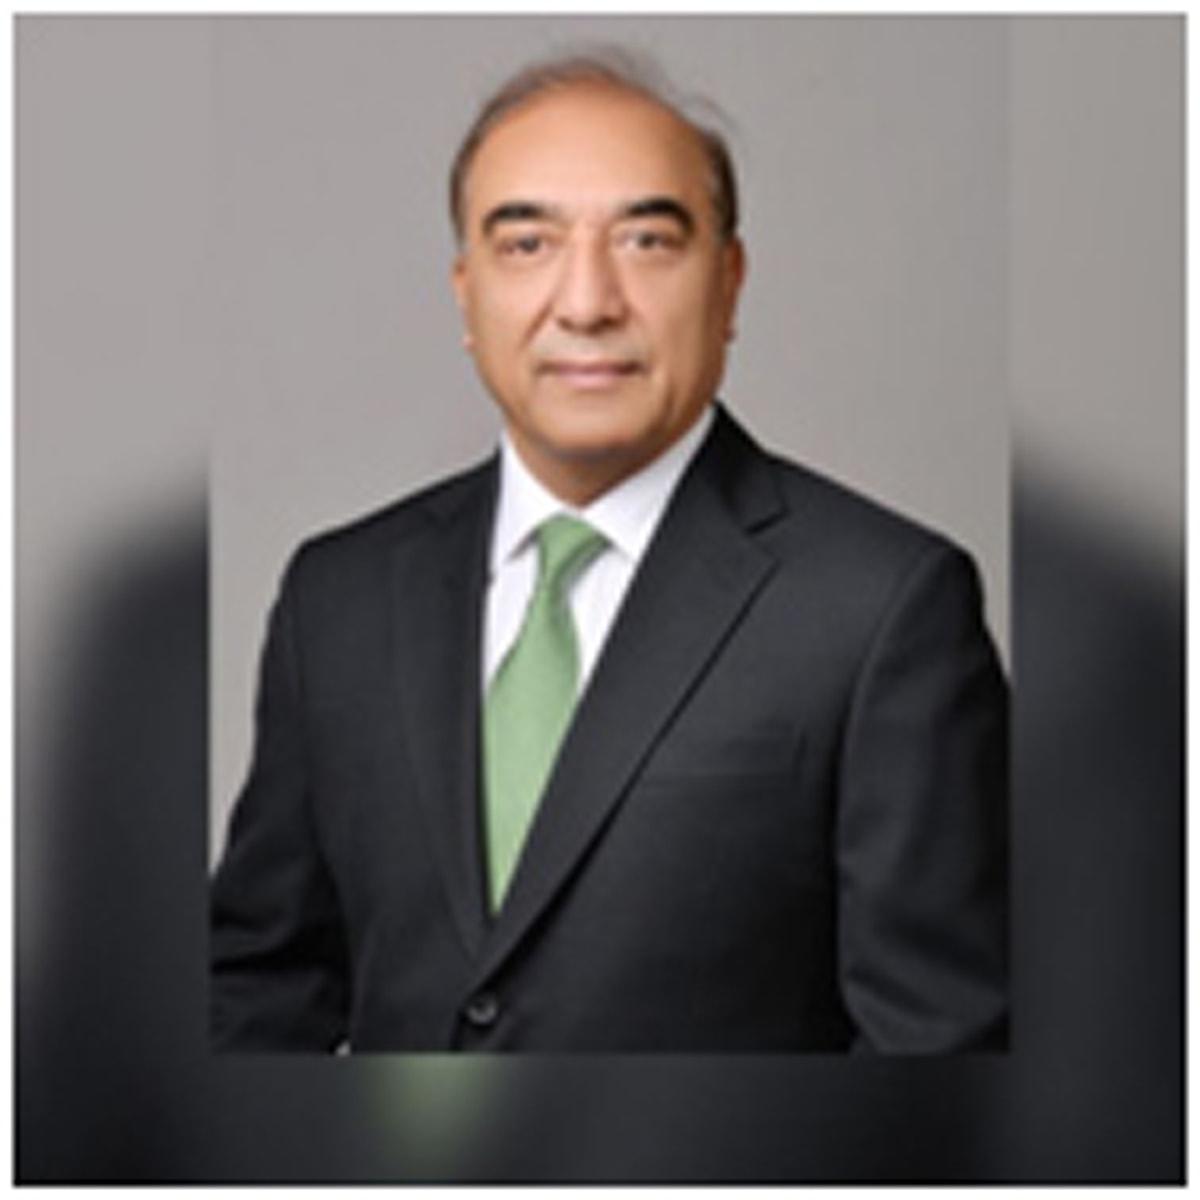 M. Shariq Vohra CEO, Rockrete & President, Karachi Chamber of Commerce and Industry (2020-2021)